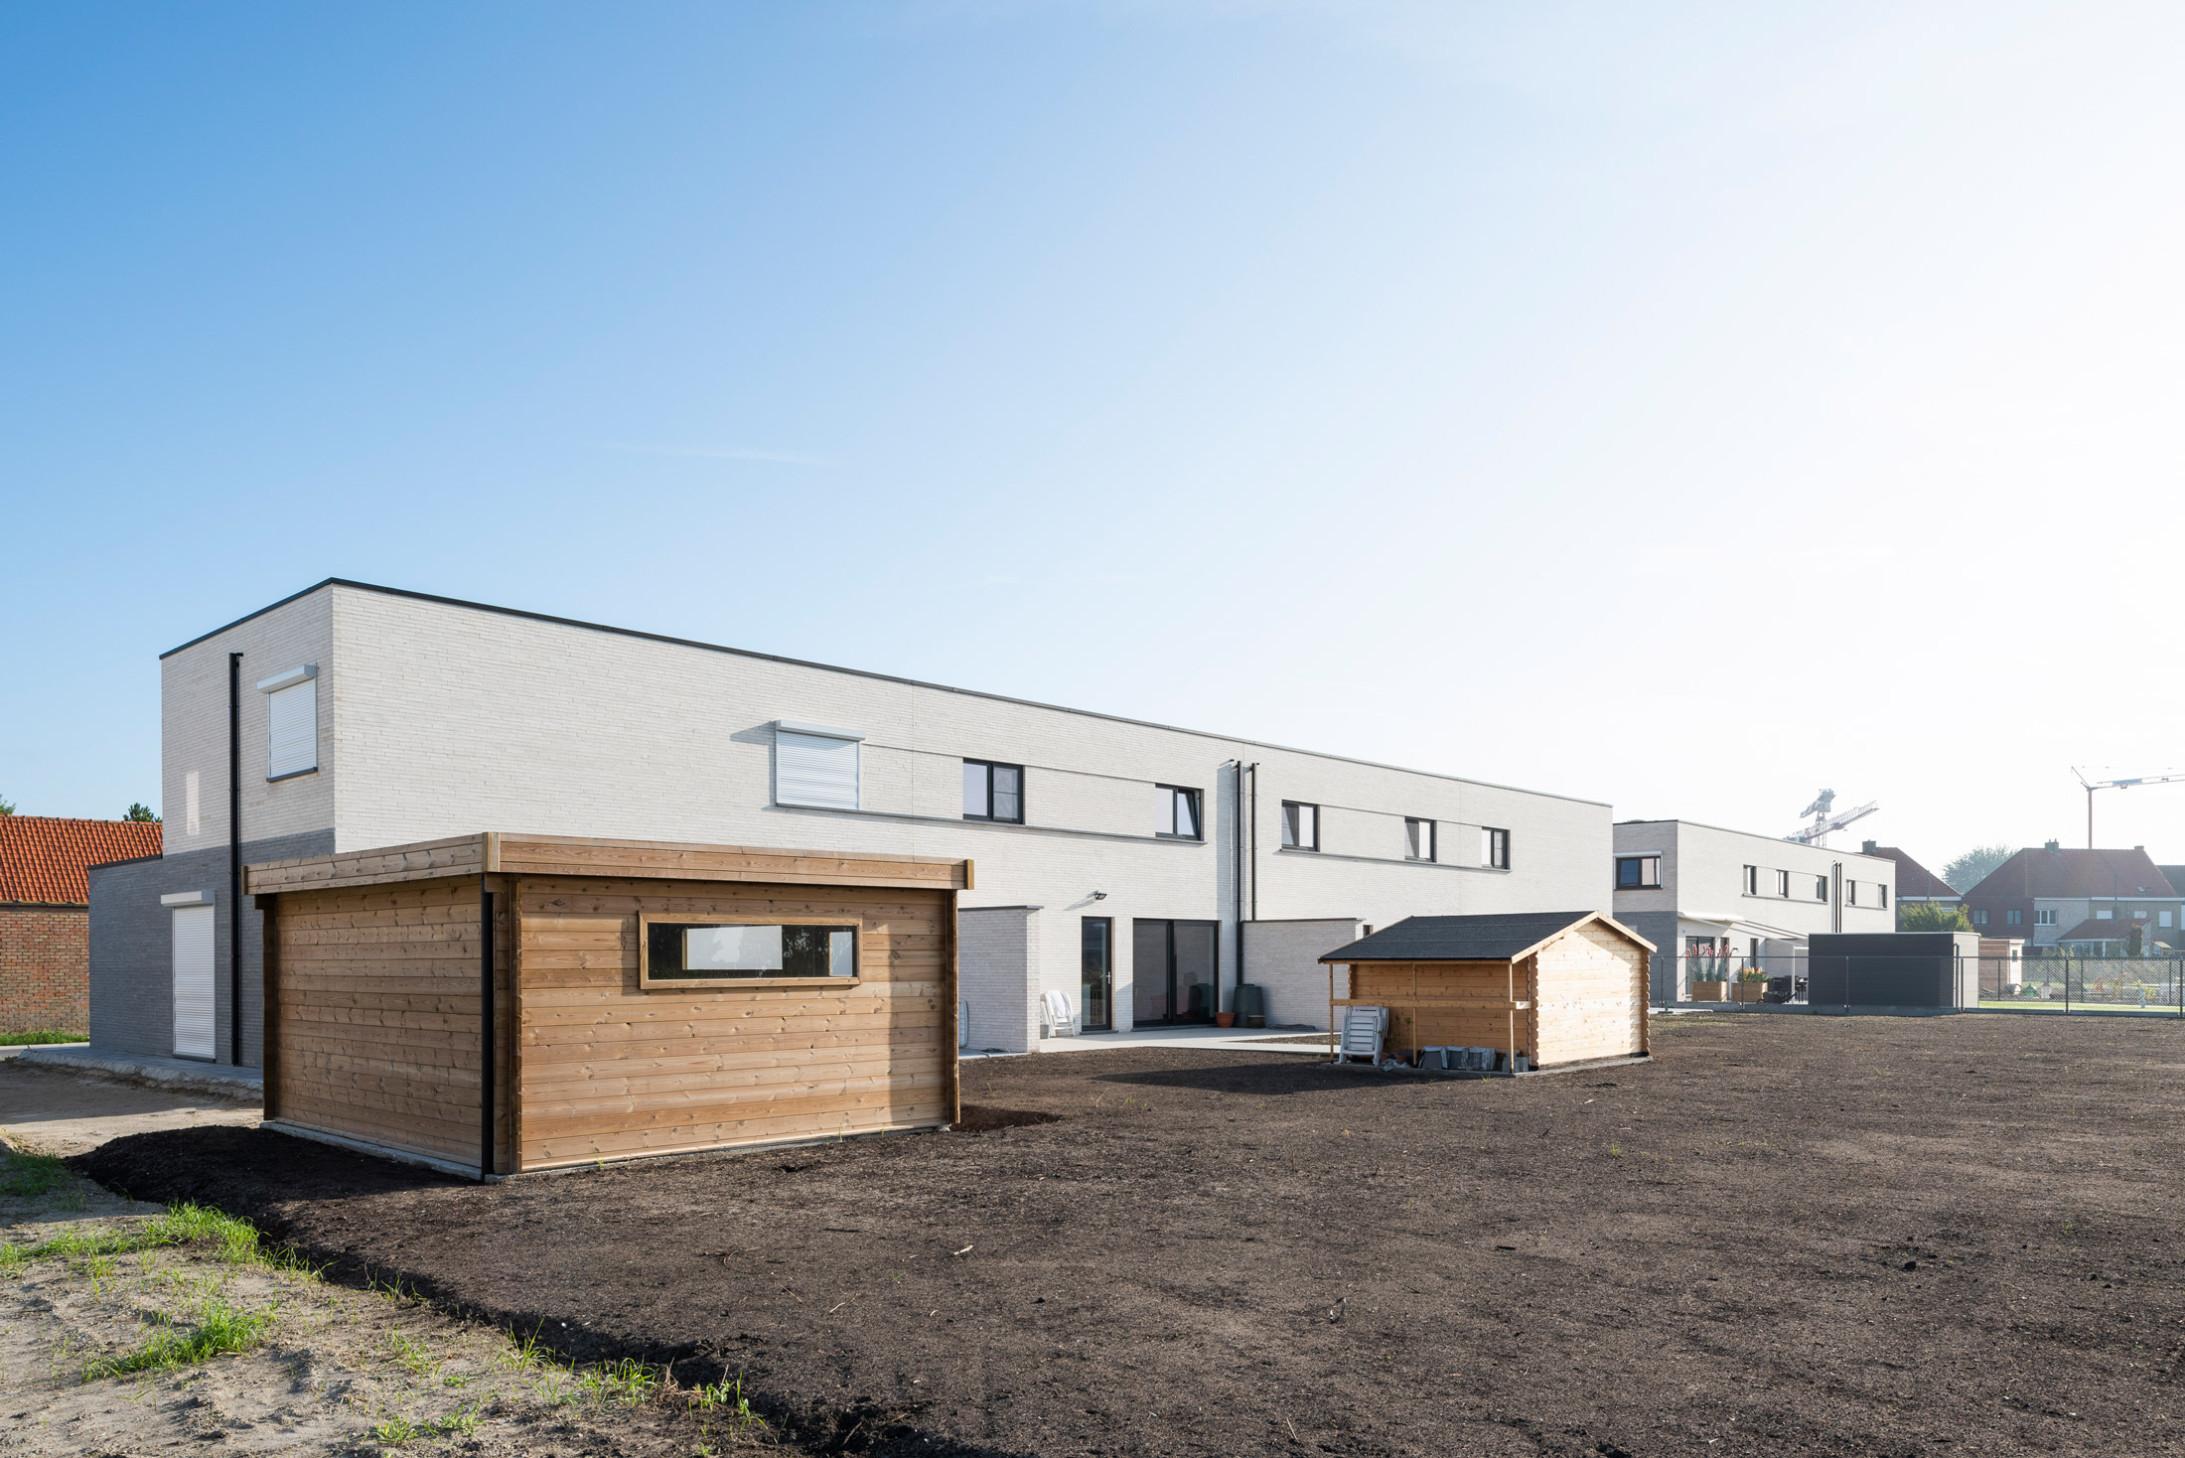 Woningengroep3_Nieuwpoort_Claeys Architecten.jpg